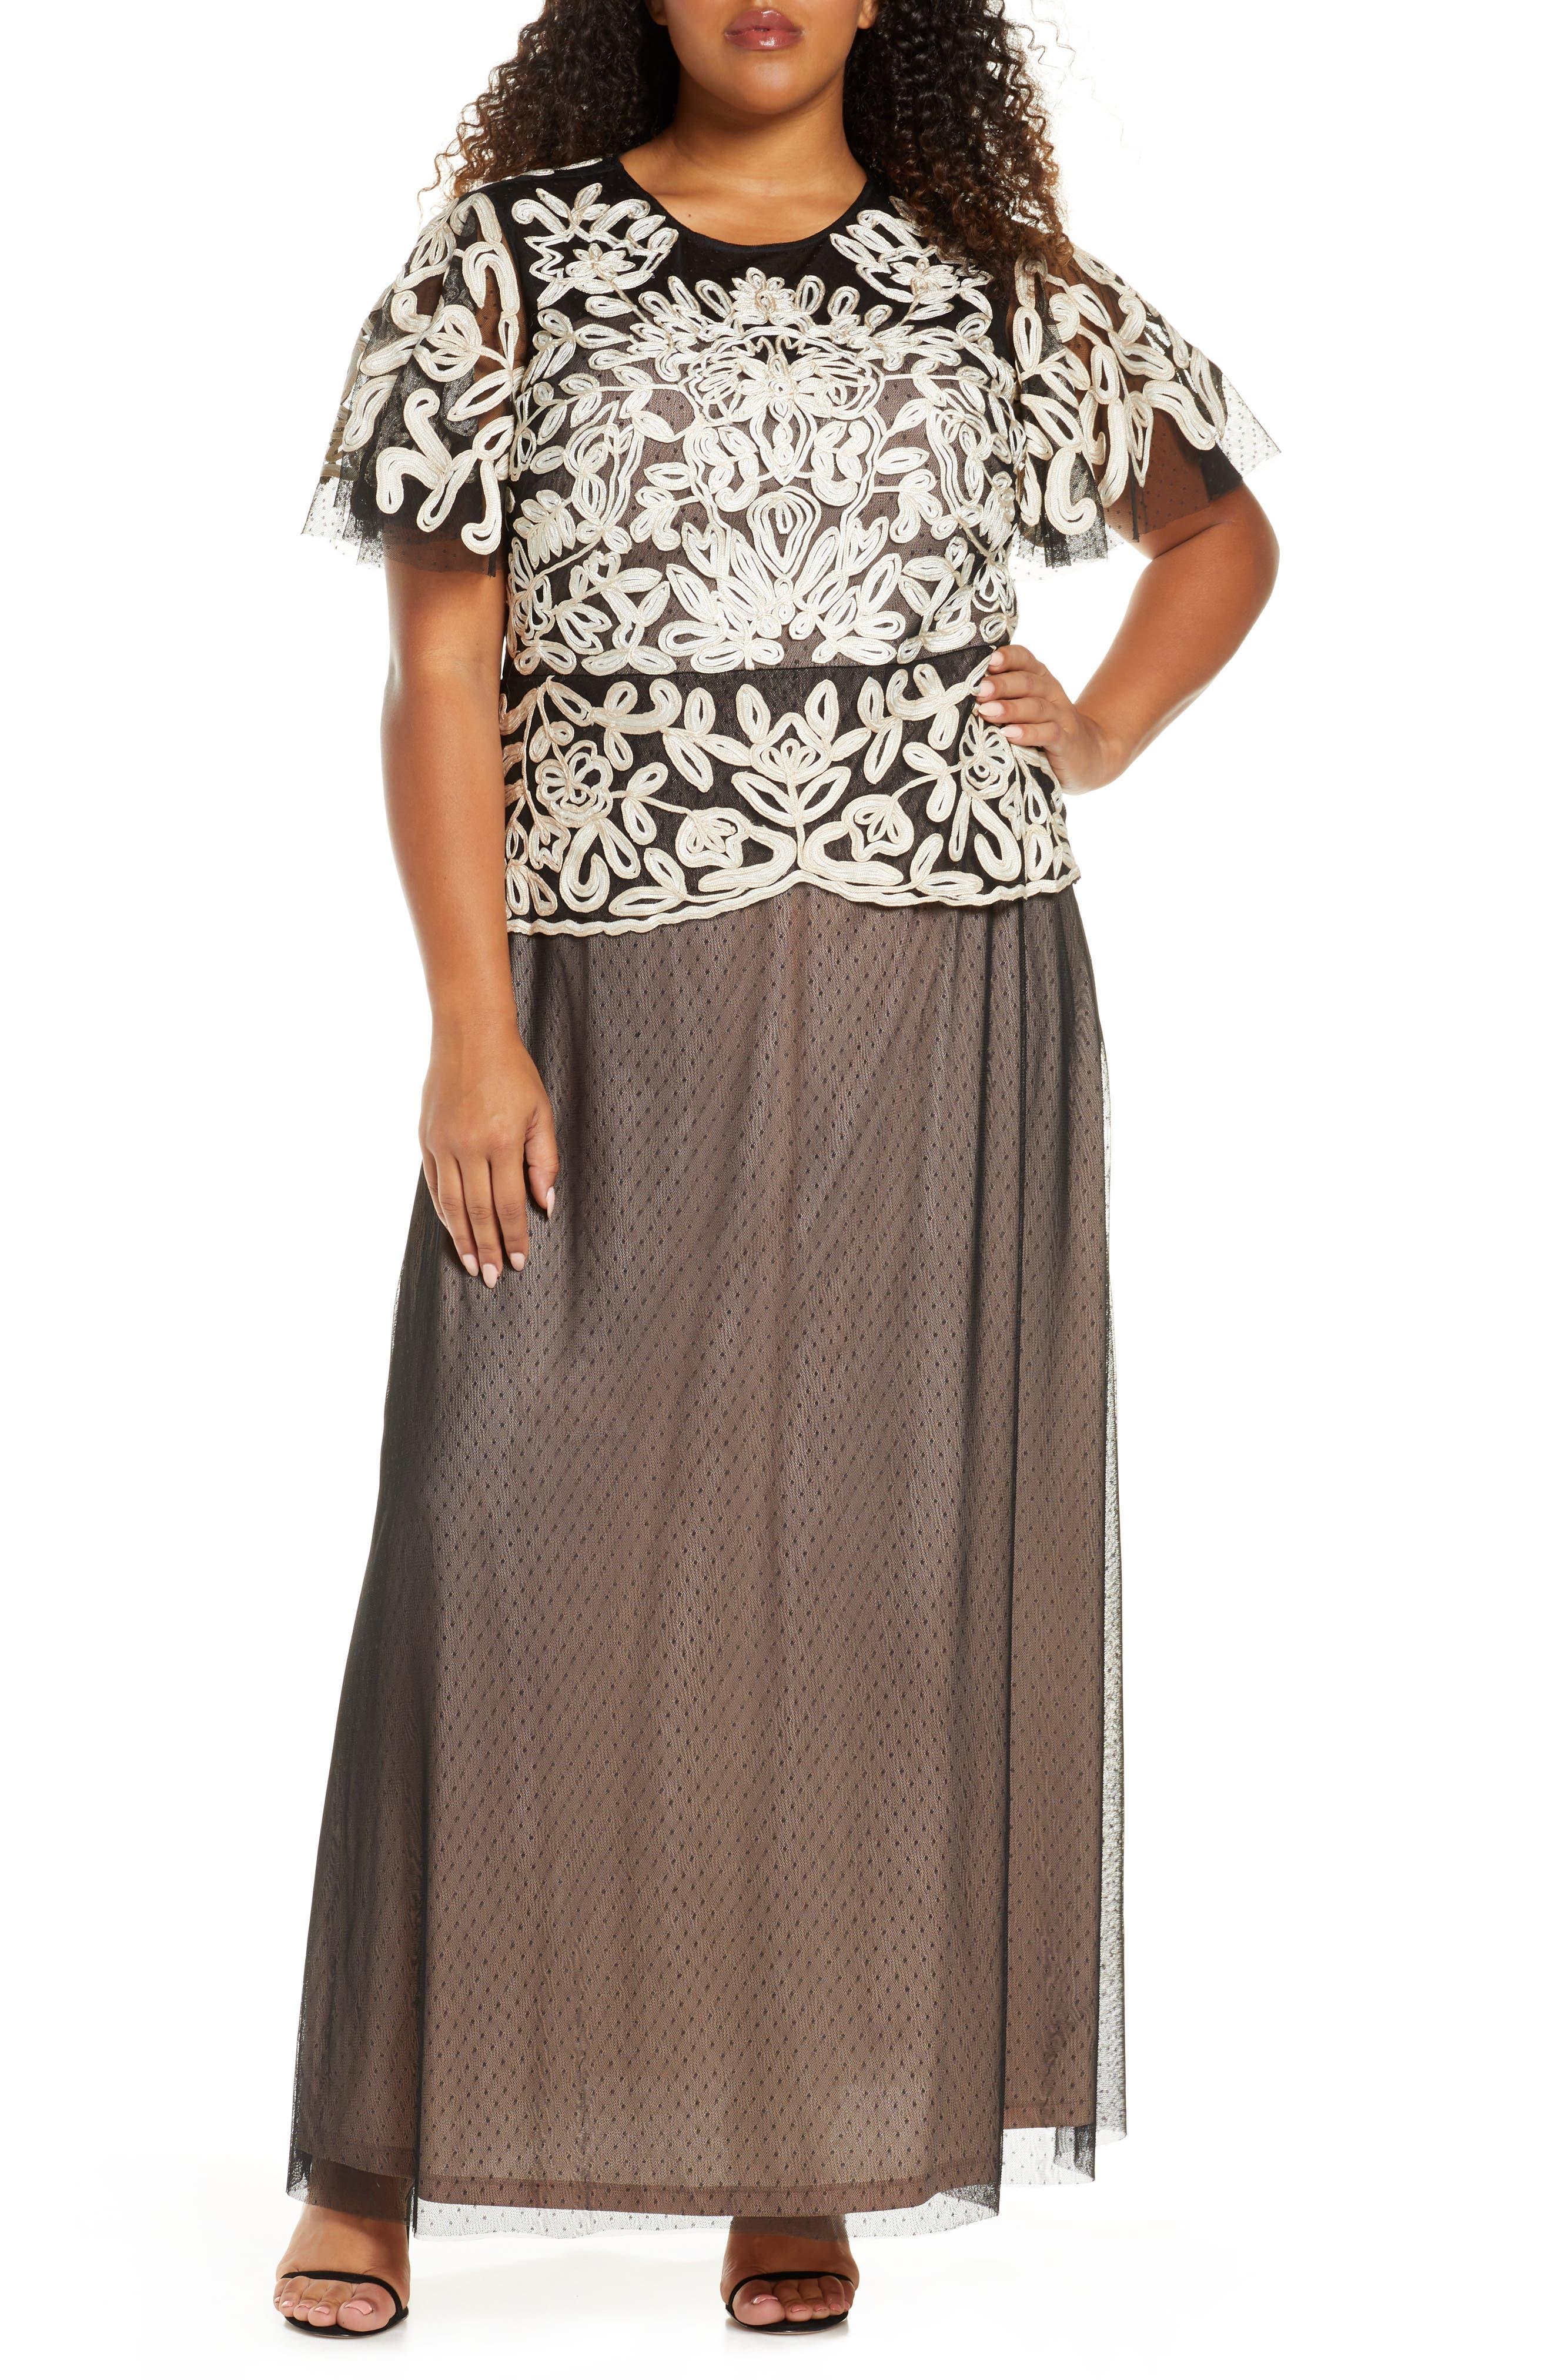 Victorian Plus Size Dresses | Edwardian Clothing, Costumes Plus Size Womens Js Collections Soutache Bodice Tulle Gown $268.00 AT vintagedancer.com